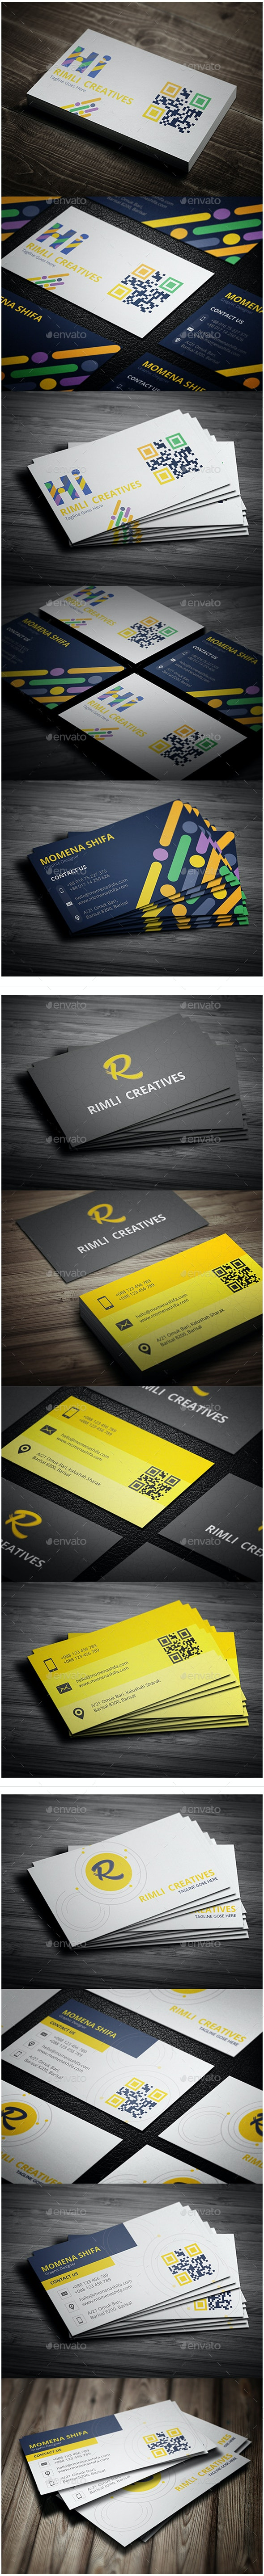 3 in 1 Sleek Business Cards Bundle - Creative Business Cards